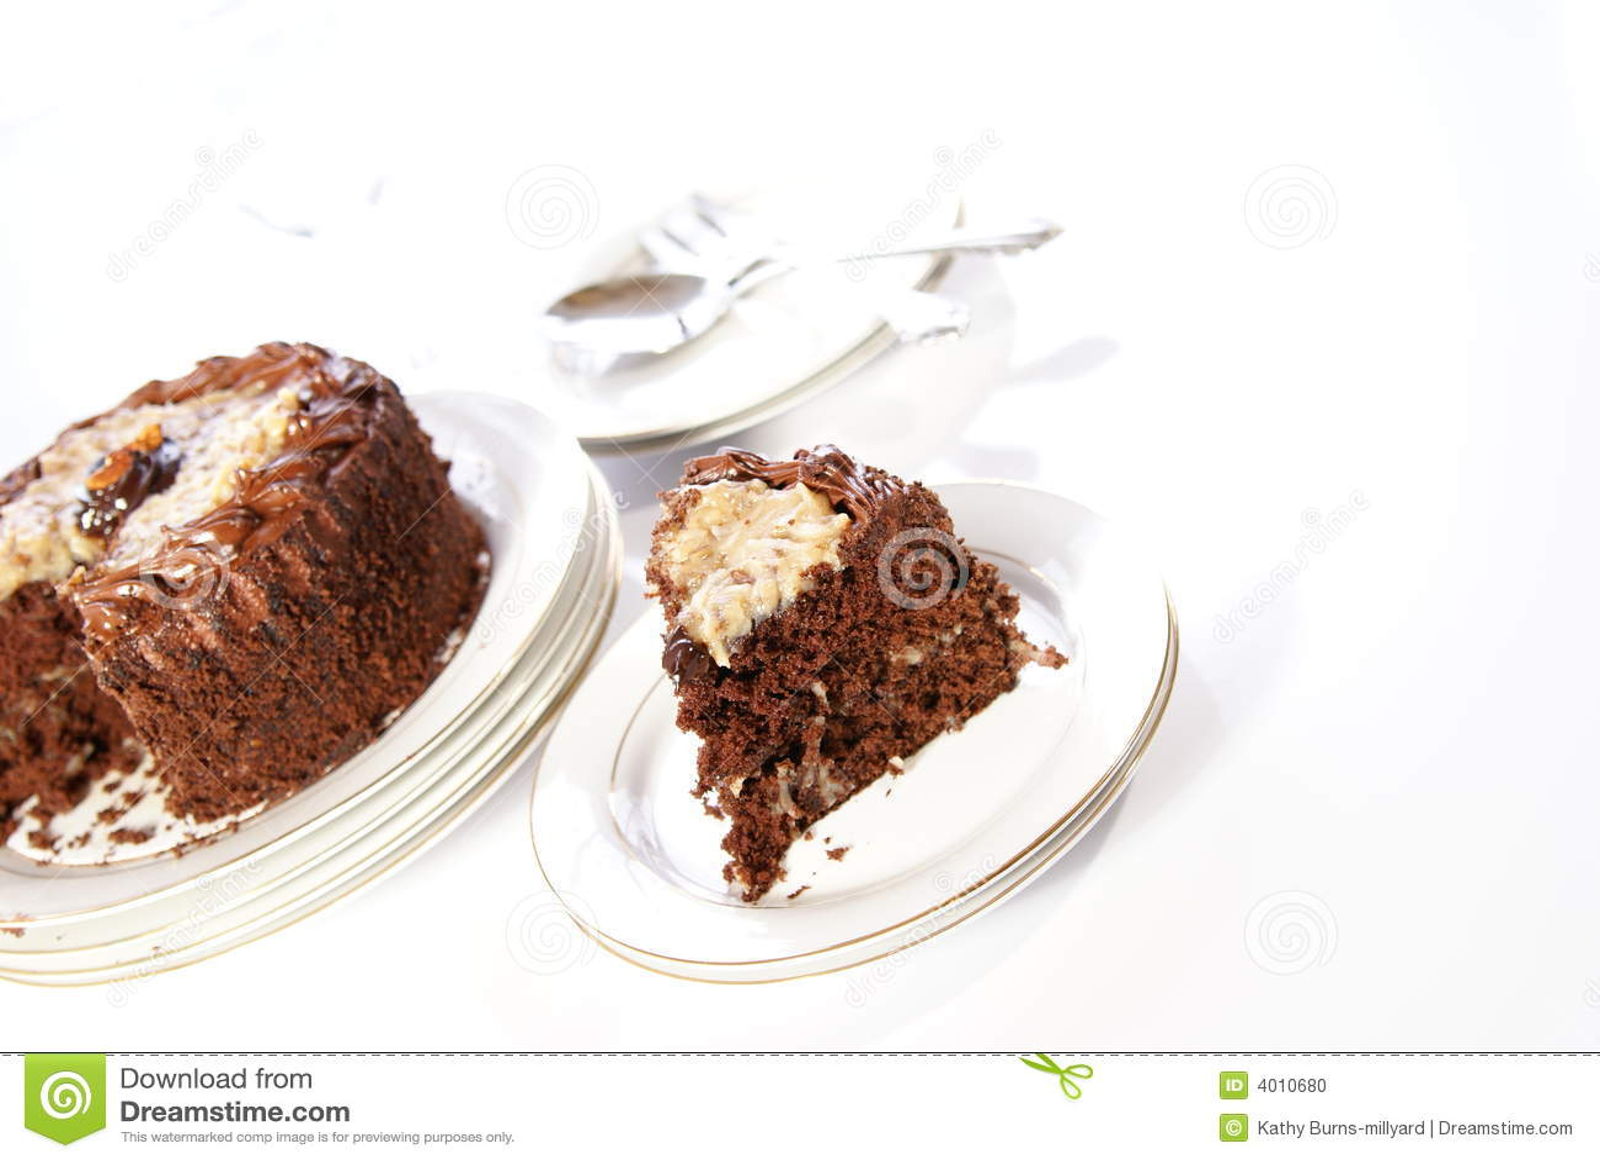 German Double-Chocolate Cake Recipe — Dishmaps